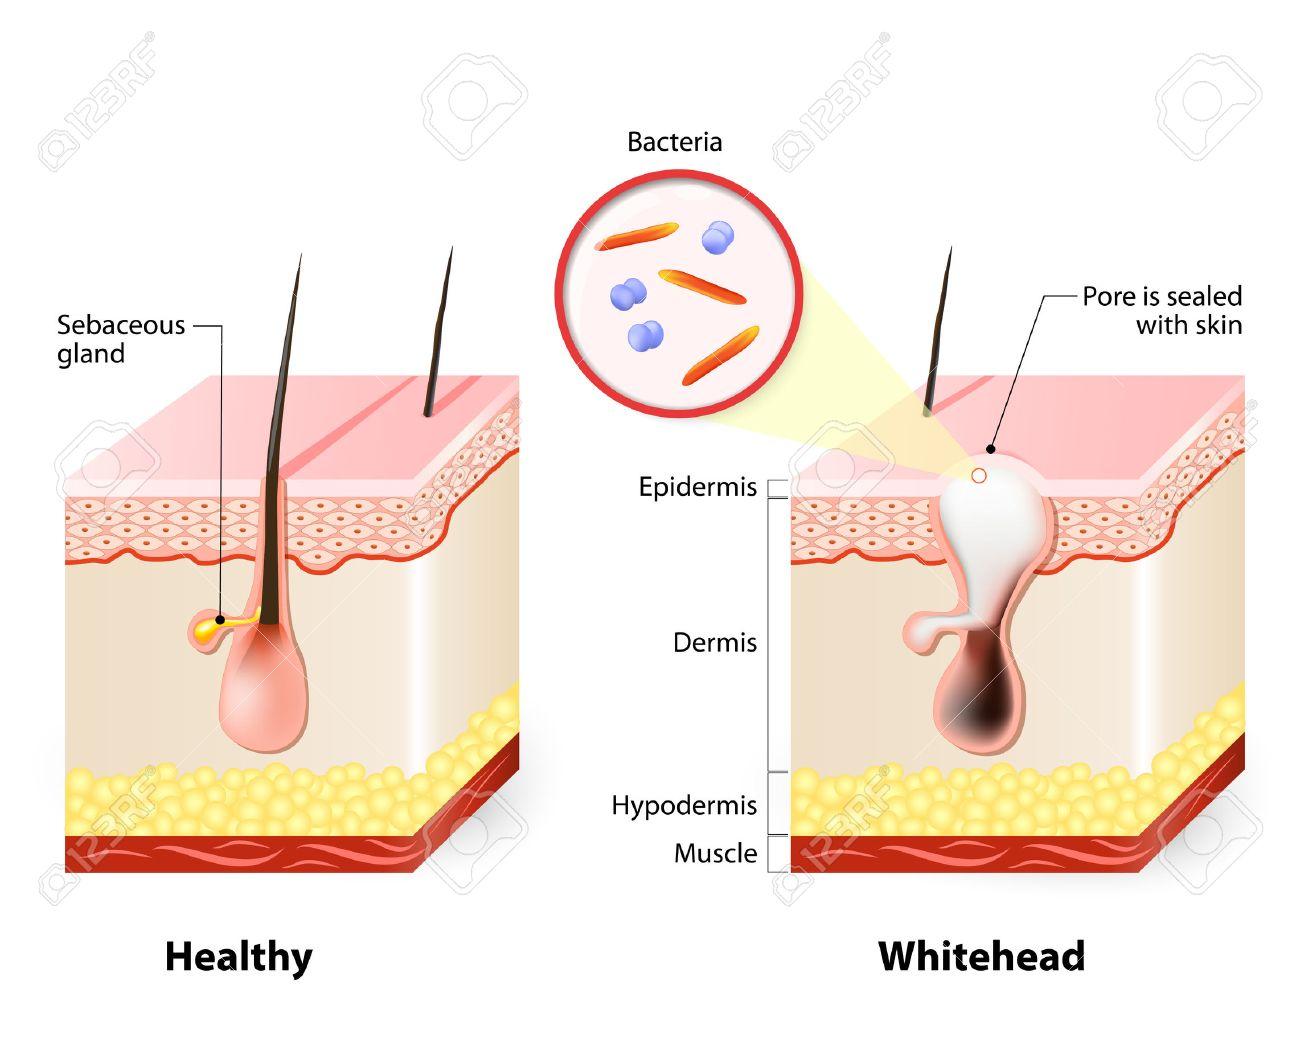 http://n3.datasn.io/data/api/v1/n3zm/image_of_skin_disease_5/by_table/skin_disease_image_download_access/20/7a/4c/41/207a4c415c9ba7cfba172a09cc2983fcaeb05f08.jpg